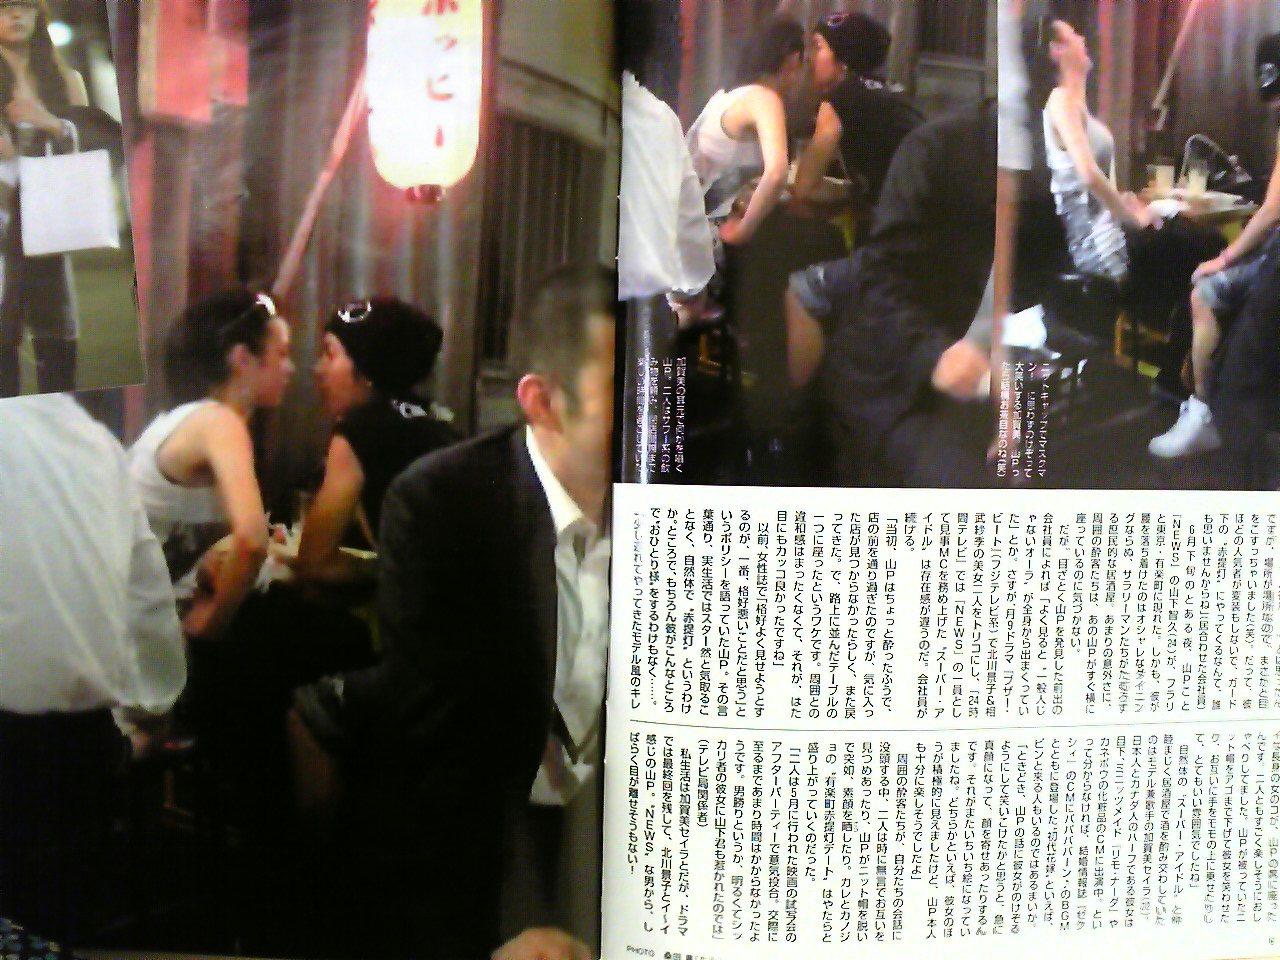 Ямасита Томохиса / Yamashita Tomohisa ≪Пишка Пишунчо≫ -2 - Страница 4 Zatudandao_18616